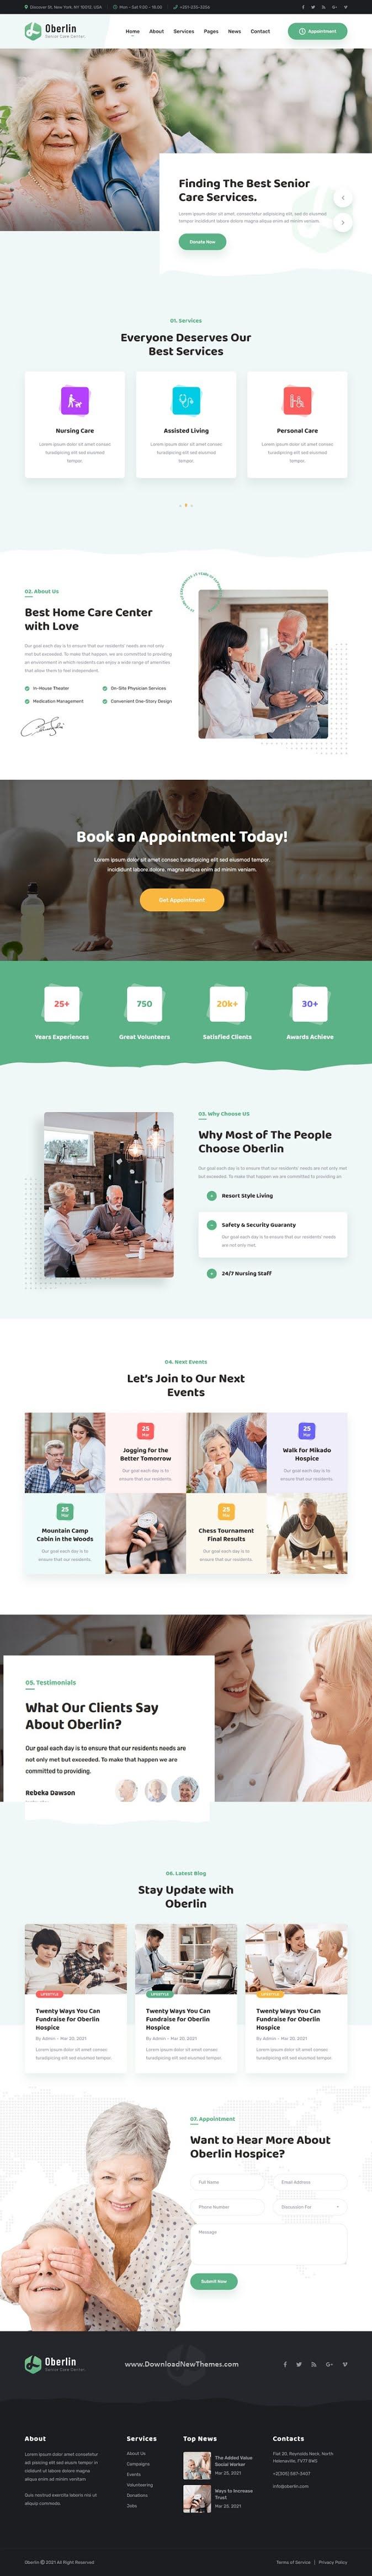 Senior Care Bootstrap Template